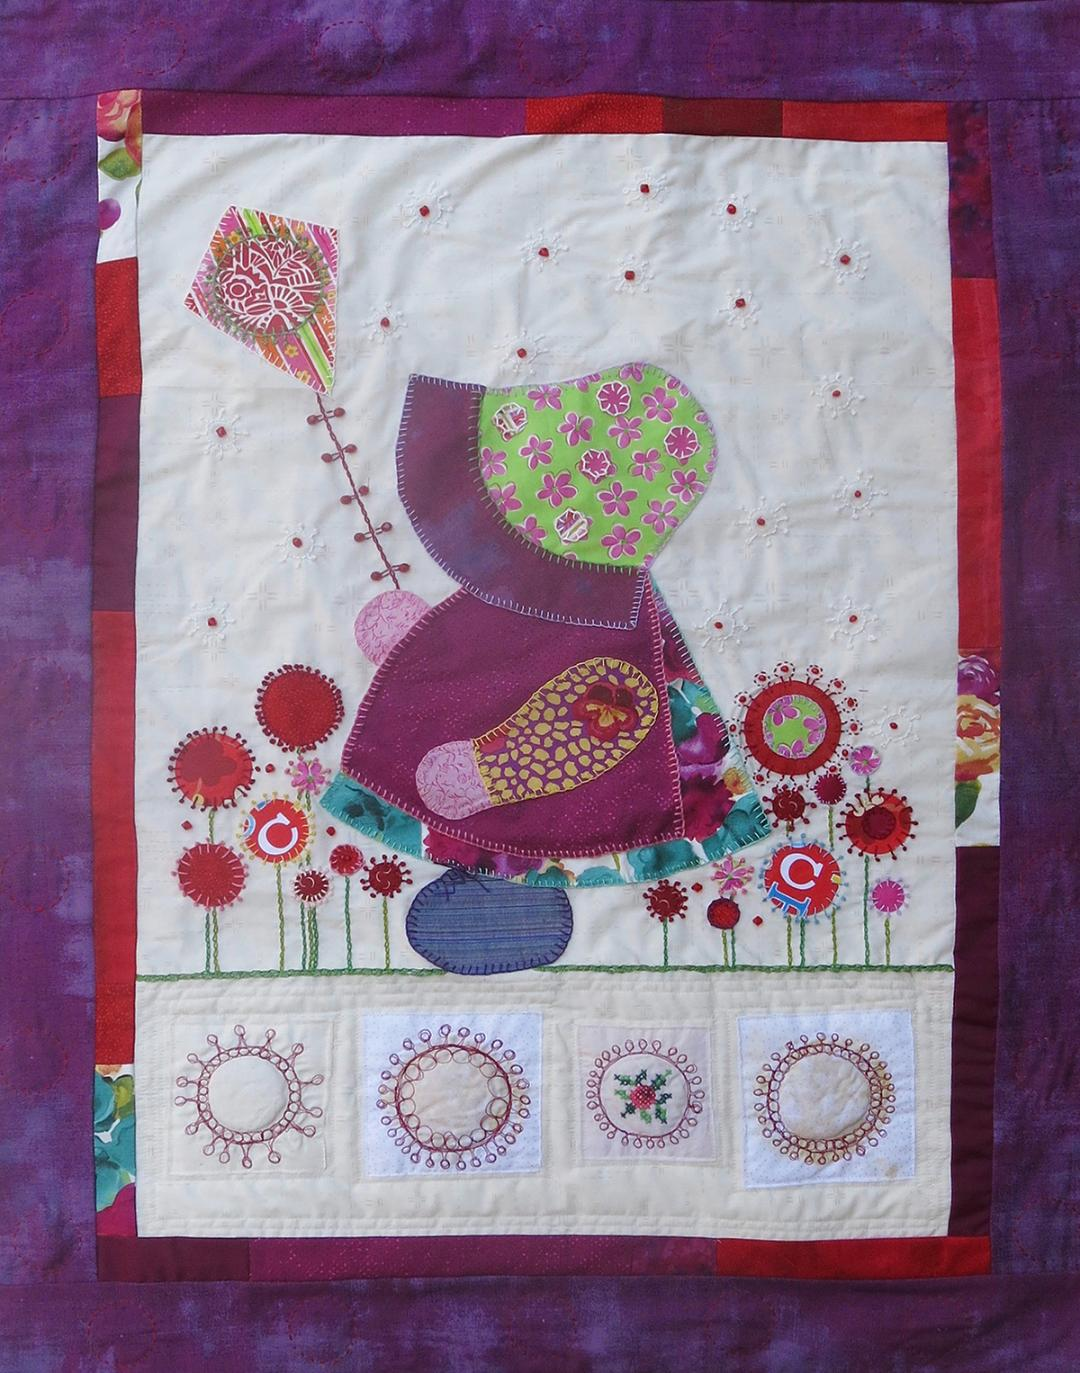 Sunbonnet Sue in the Garden of Coronavirus - Ellen November - Fabric hand embroidered